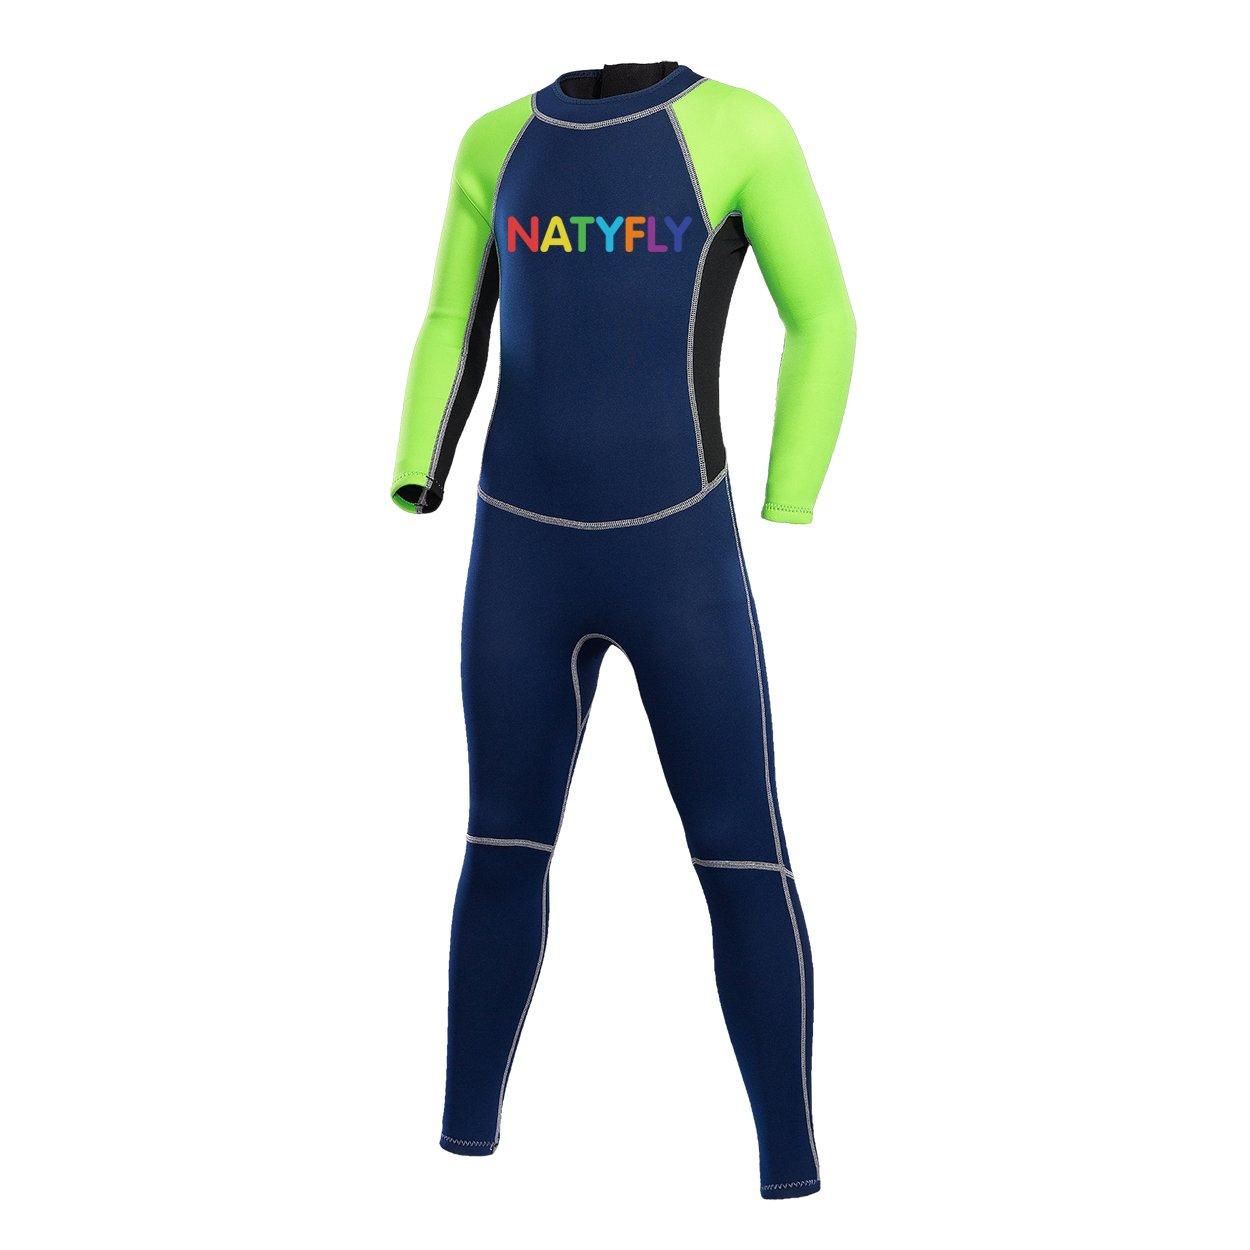 NATYFLY Neoprene Wetsuits for Kids Boys Girls Back Zipper One Piece Swimsuit UV Protection-Brand (Green-2MM-Long Sleeve, S-for Height 37''-42'')